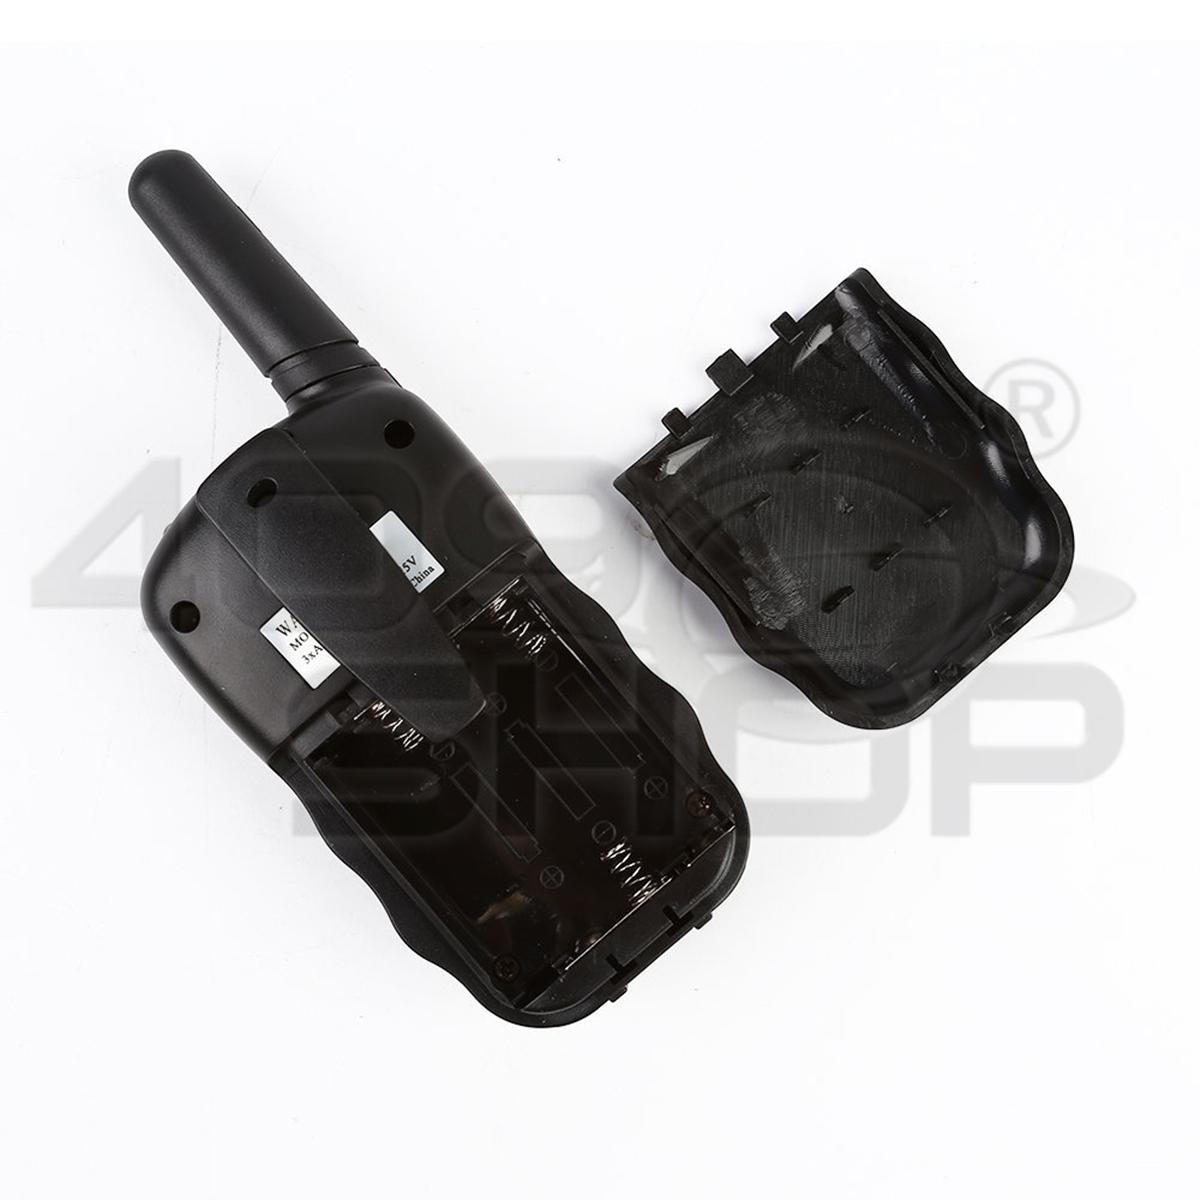 2017 New 2x Baofeng BF-T3 Black Handheld Walkie Talkie UHF Mini Two Way Radio